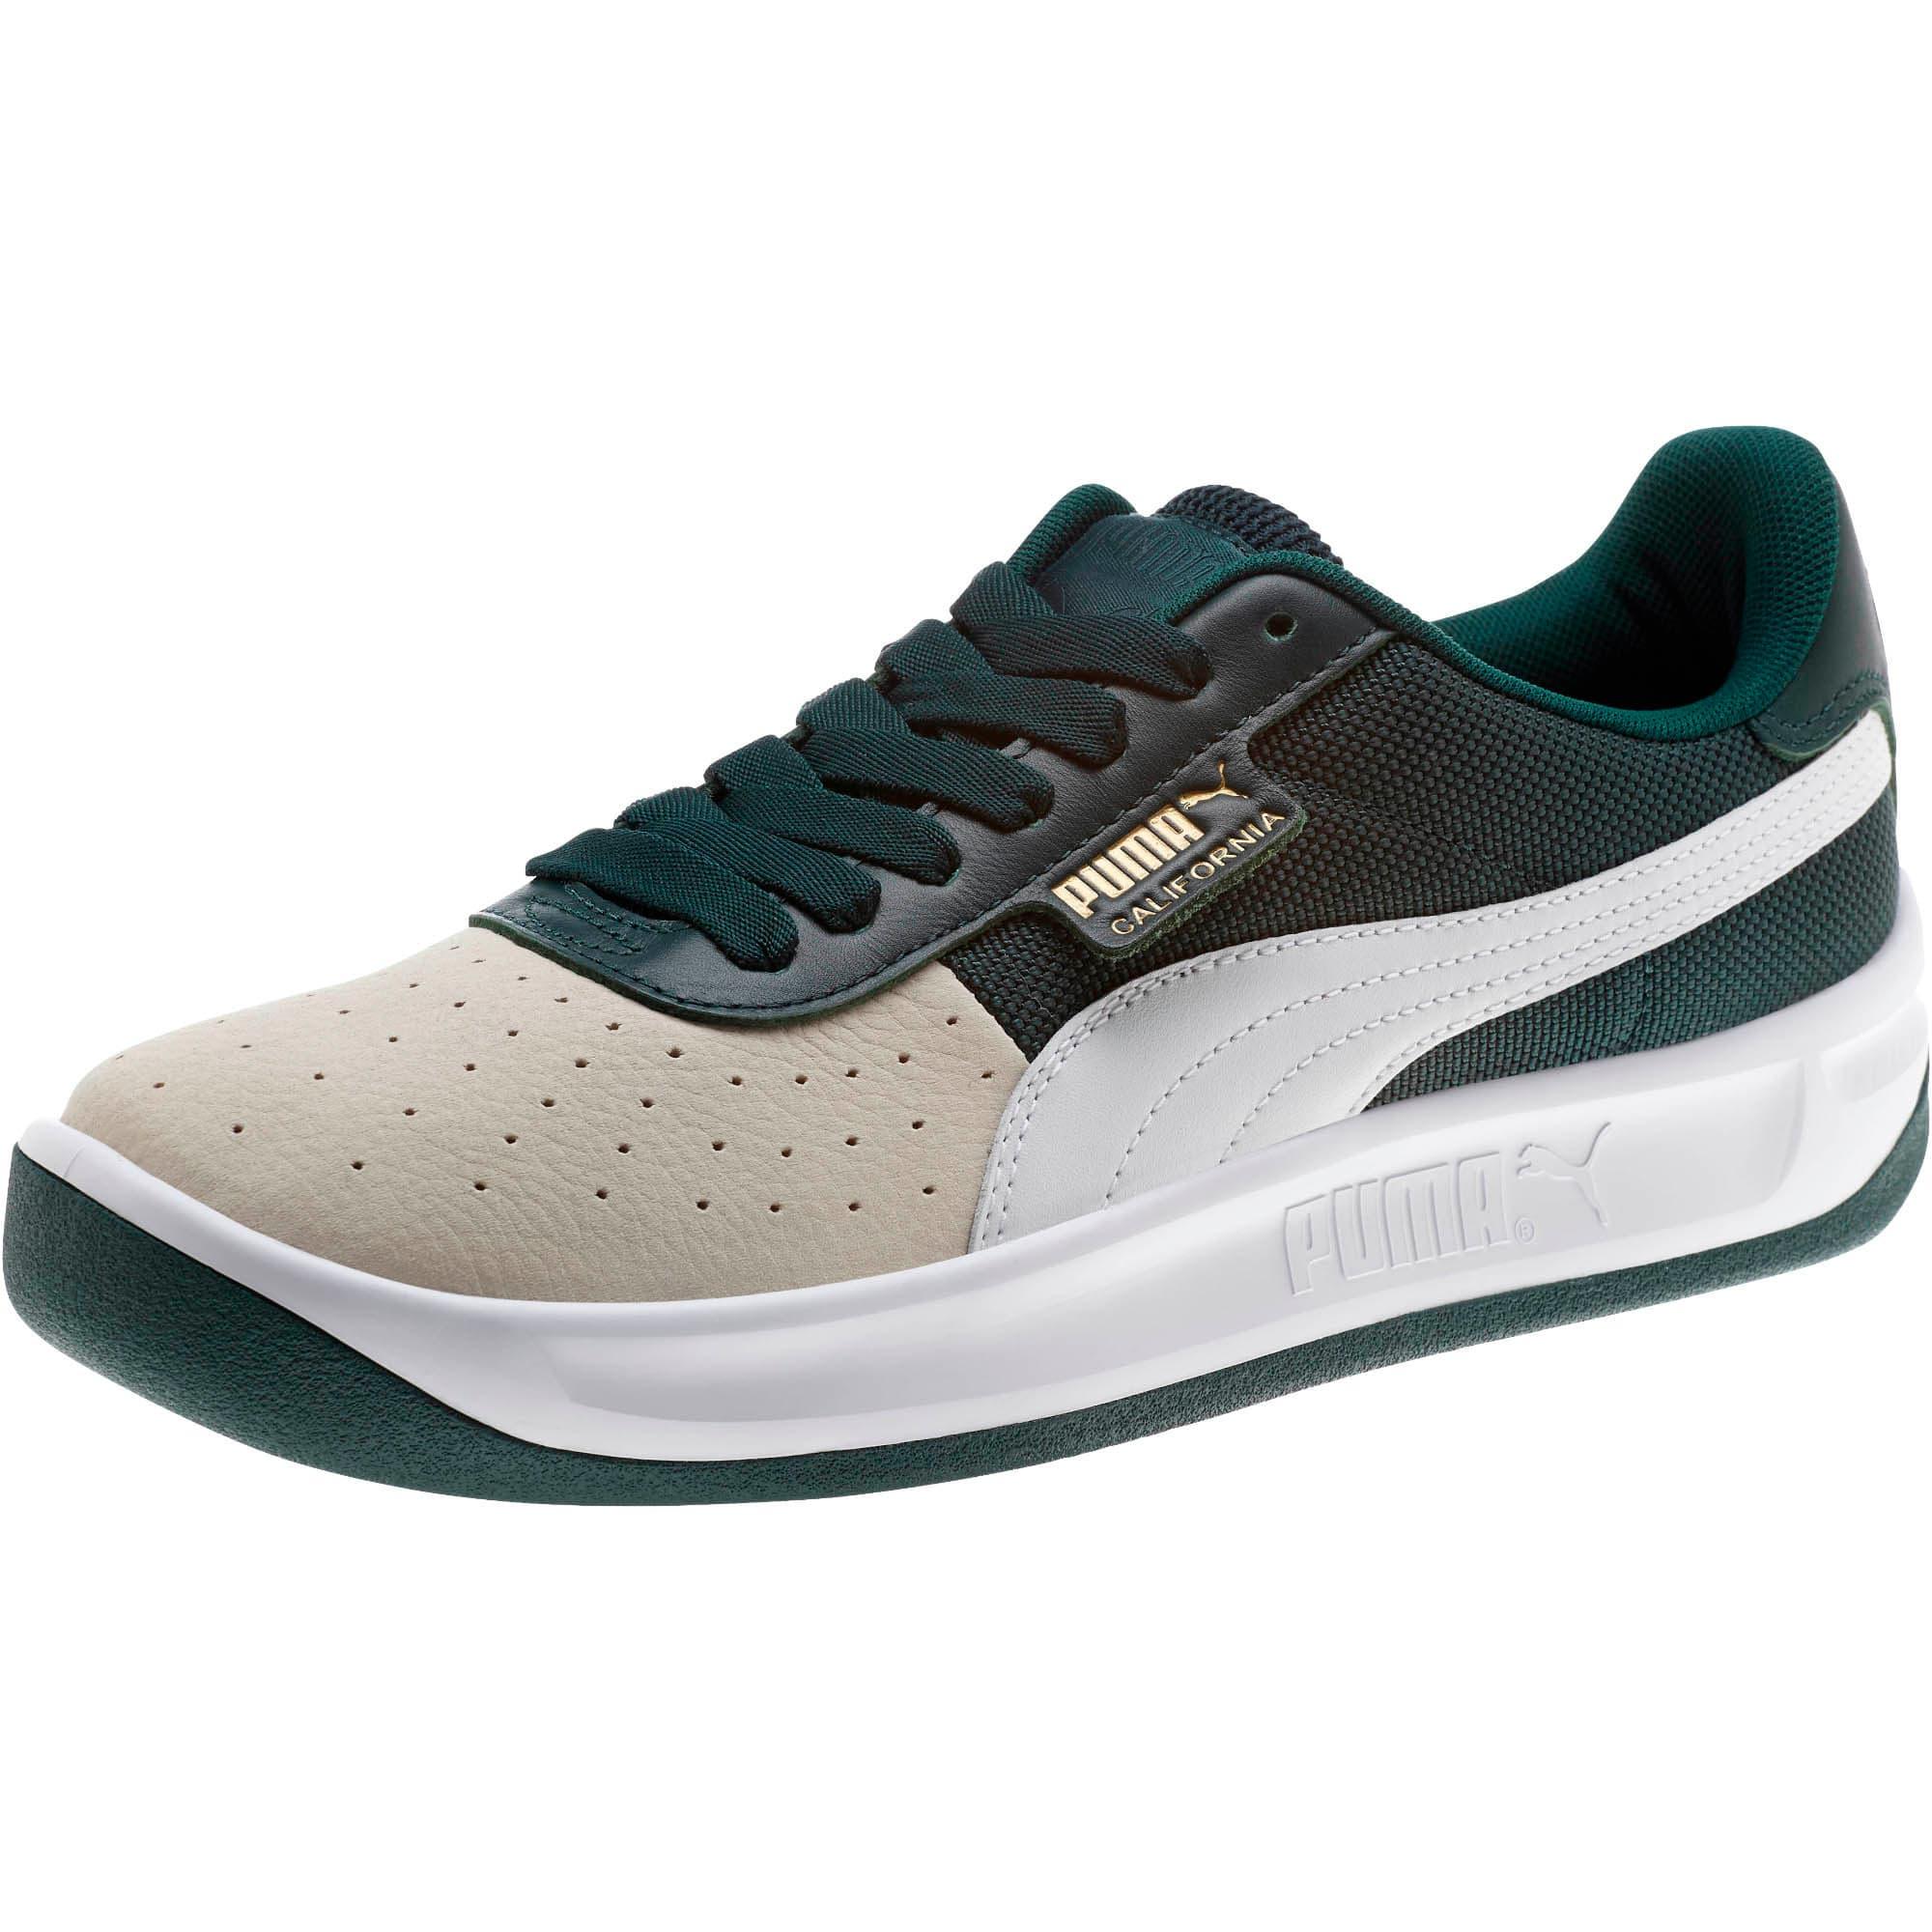 Thumbnail 1 of California Sneakers, WhsprWht-PonderosaPin-PumWht, medium